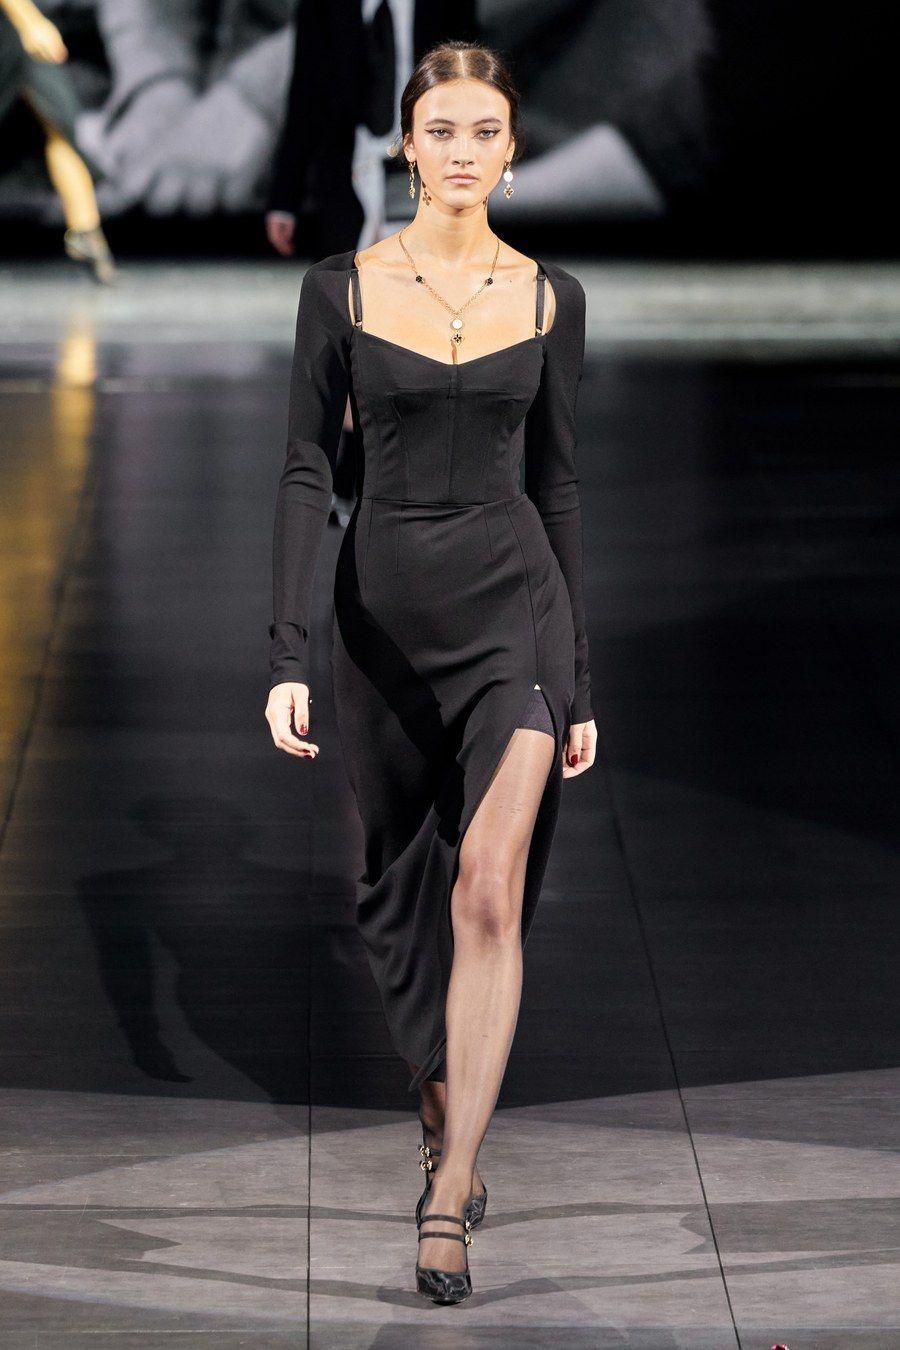 Dolce & Gabbana Fall 2020 Ready-to-Wear Fashion Show -  Dolce & Gabbana Fall 2020 Ready-to-Wear collection, runway looks, beauty, models, and reviews.  - #80sRunwayFashion #Dolce #Fall #fashion #Gabbana #ReadytoWear #RunwayFashionalexandermcqueen #RunwayFashioncasual #RunwayFashiondolce&gabbana #RunwayFashiongowns #RunwayFashiongucci #RunwayFashionvalentino #RunwayFashionversace #RunwayFashionvideos #show